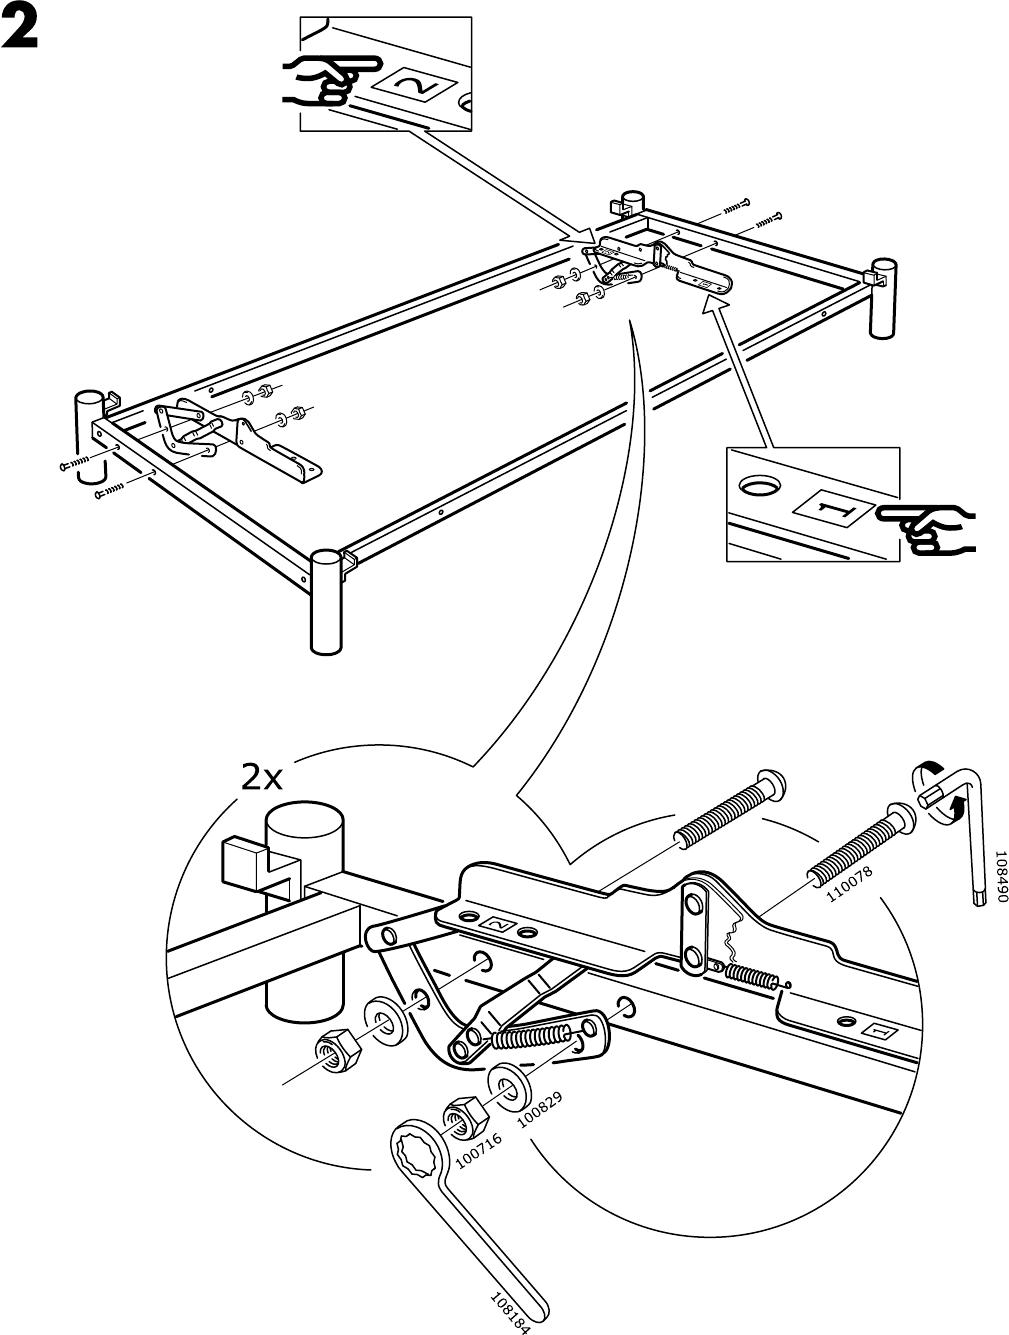 Ikea Beddinge Bedbank.Manual Ikea Beddinge Lovas Page 5 Of 8 All Languages